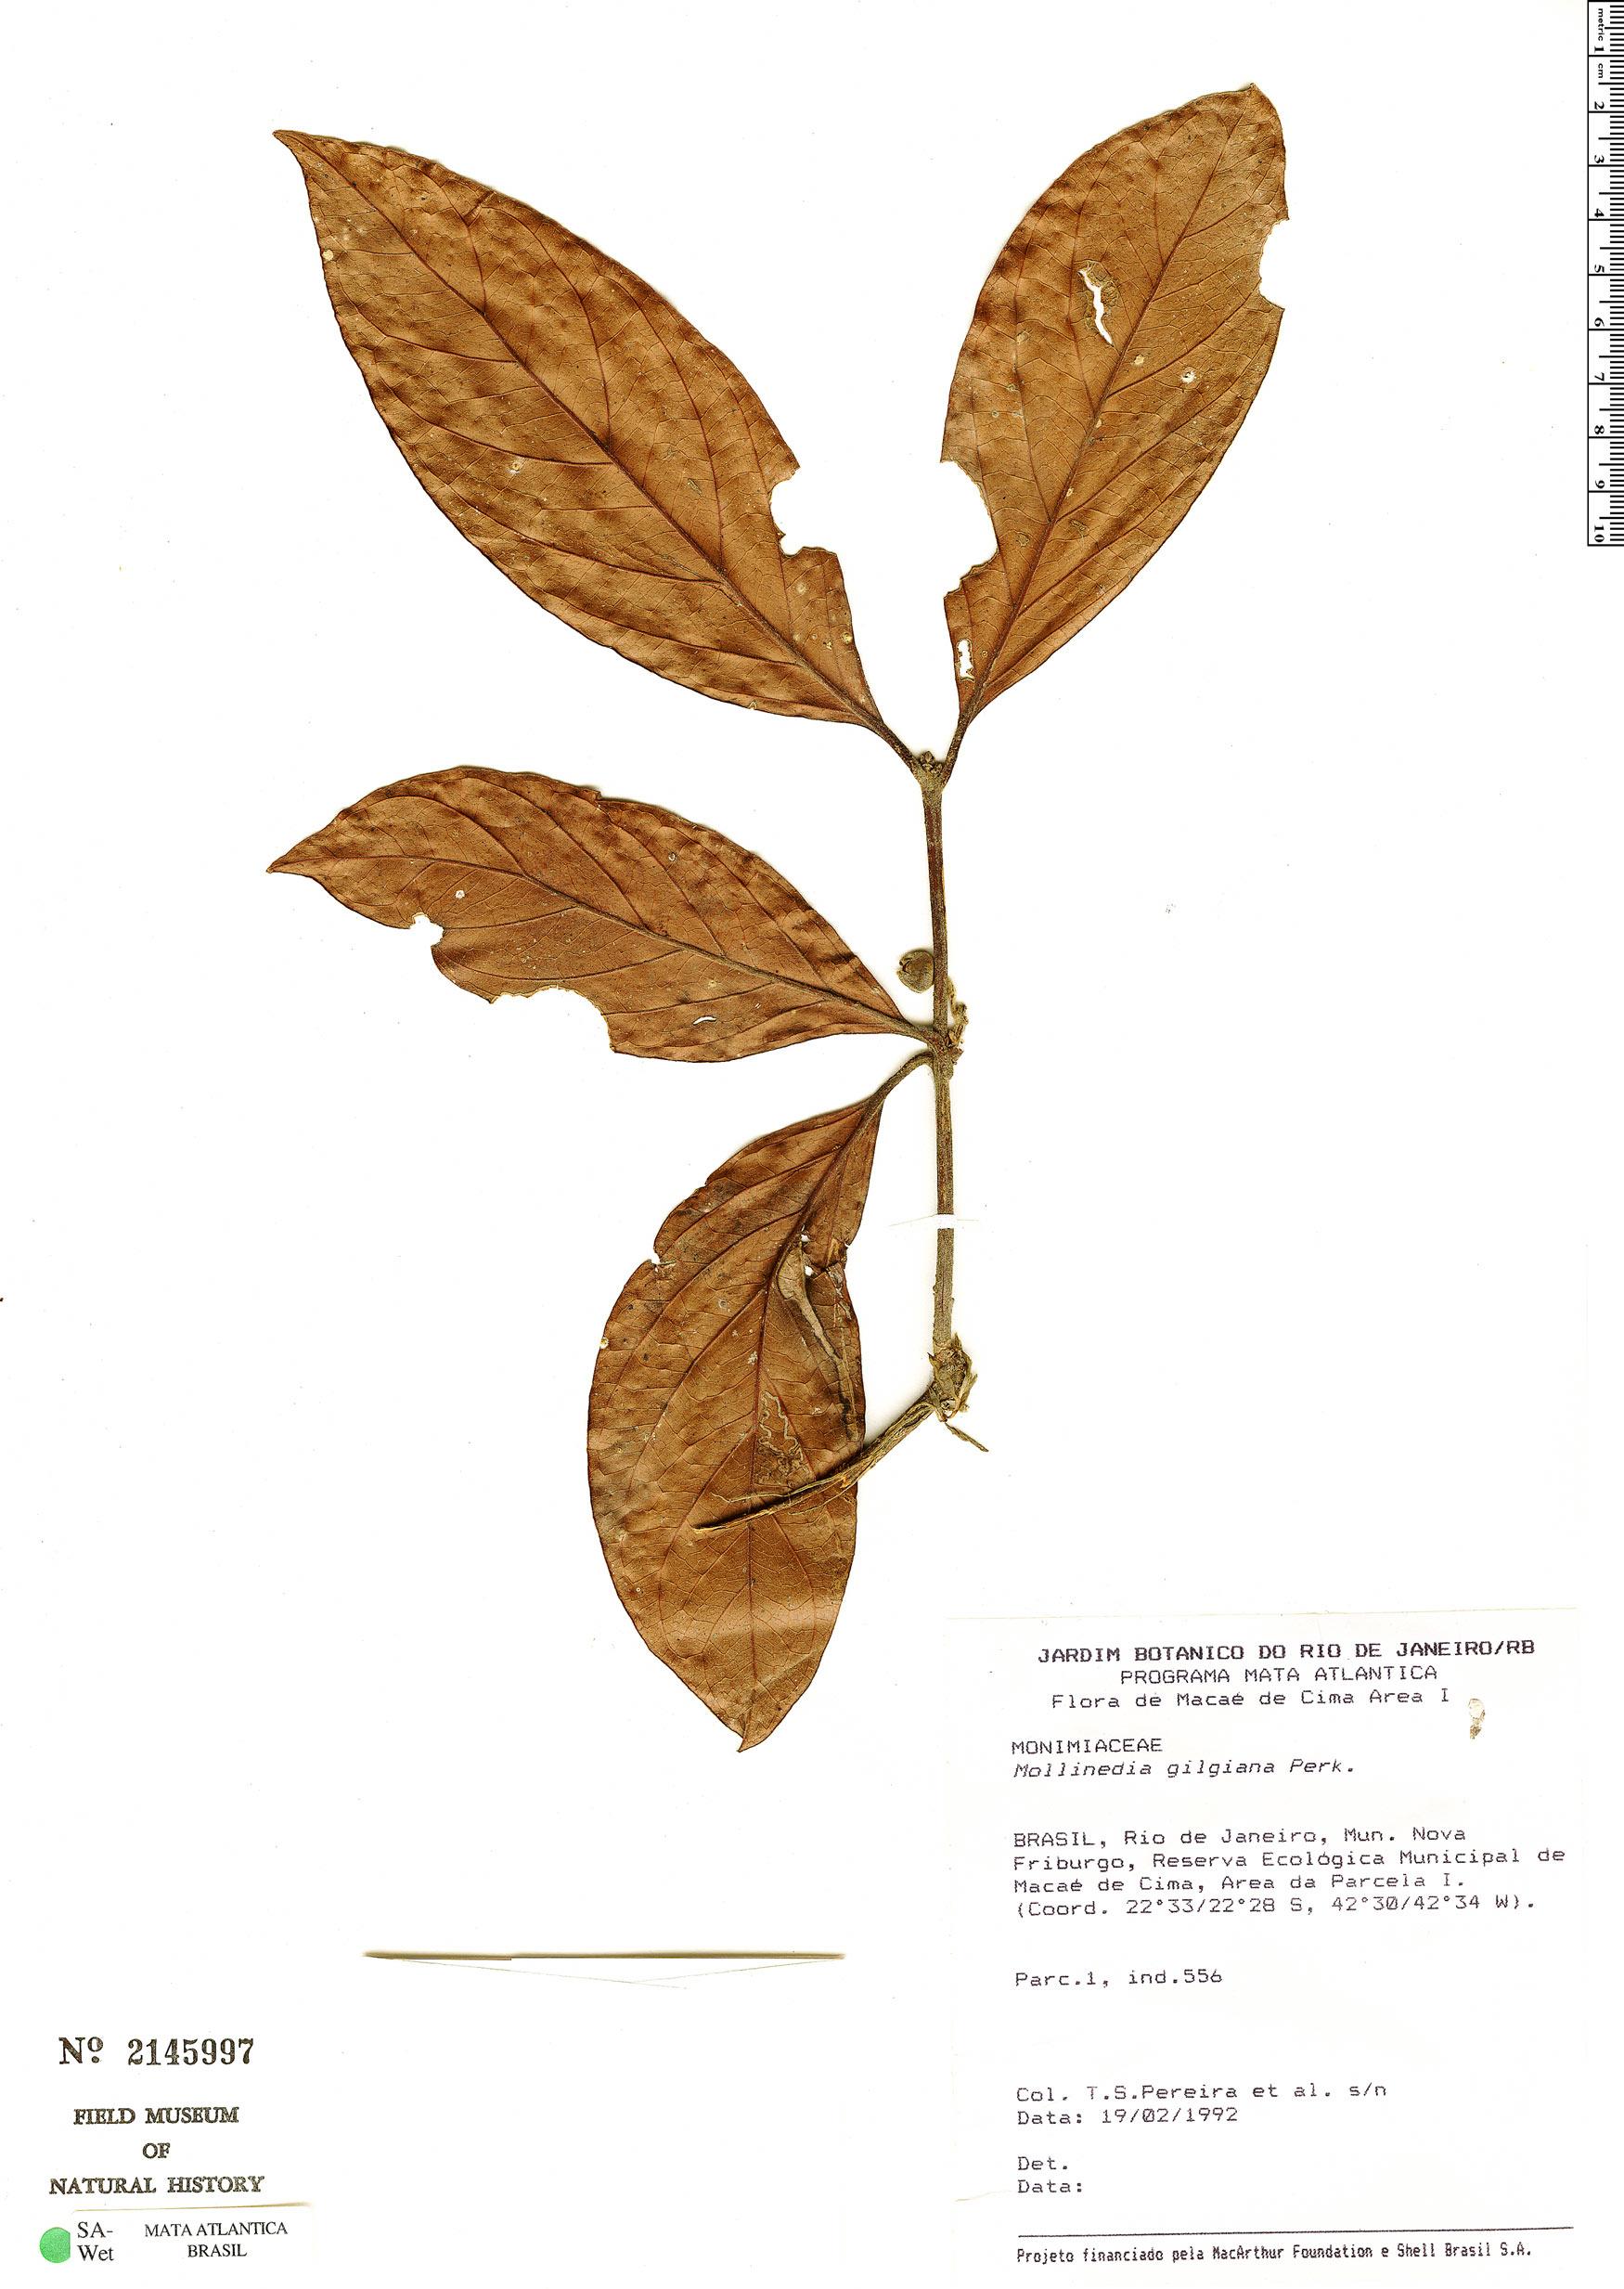 Specimen: Mollinedia gilgiana